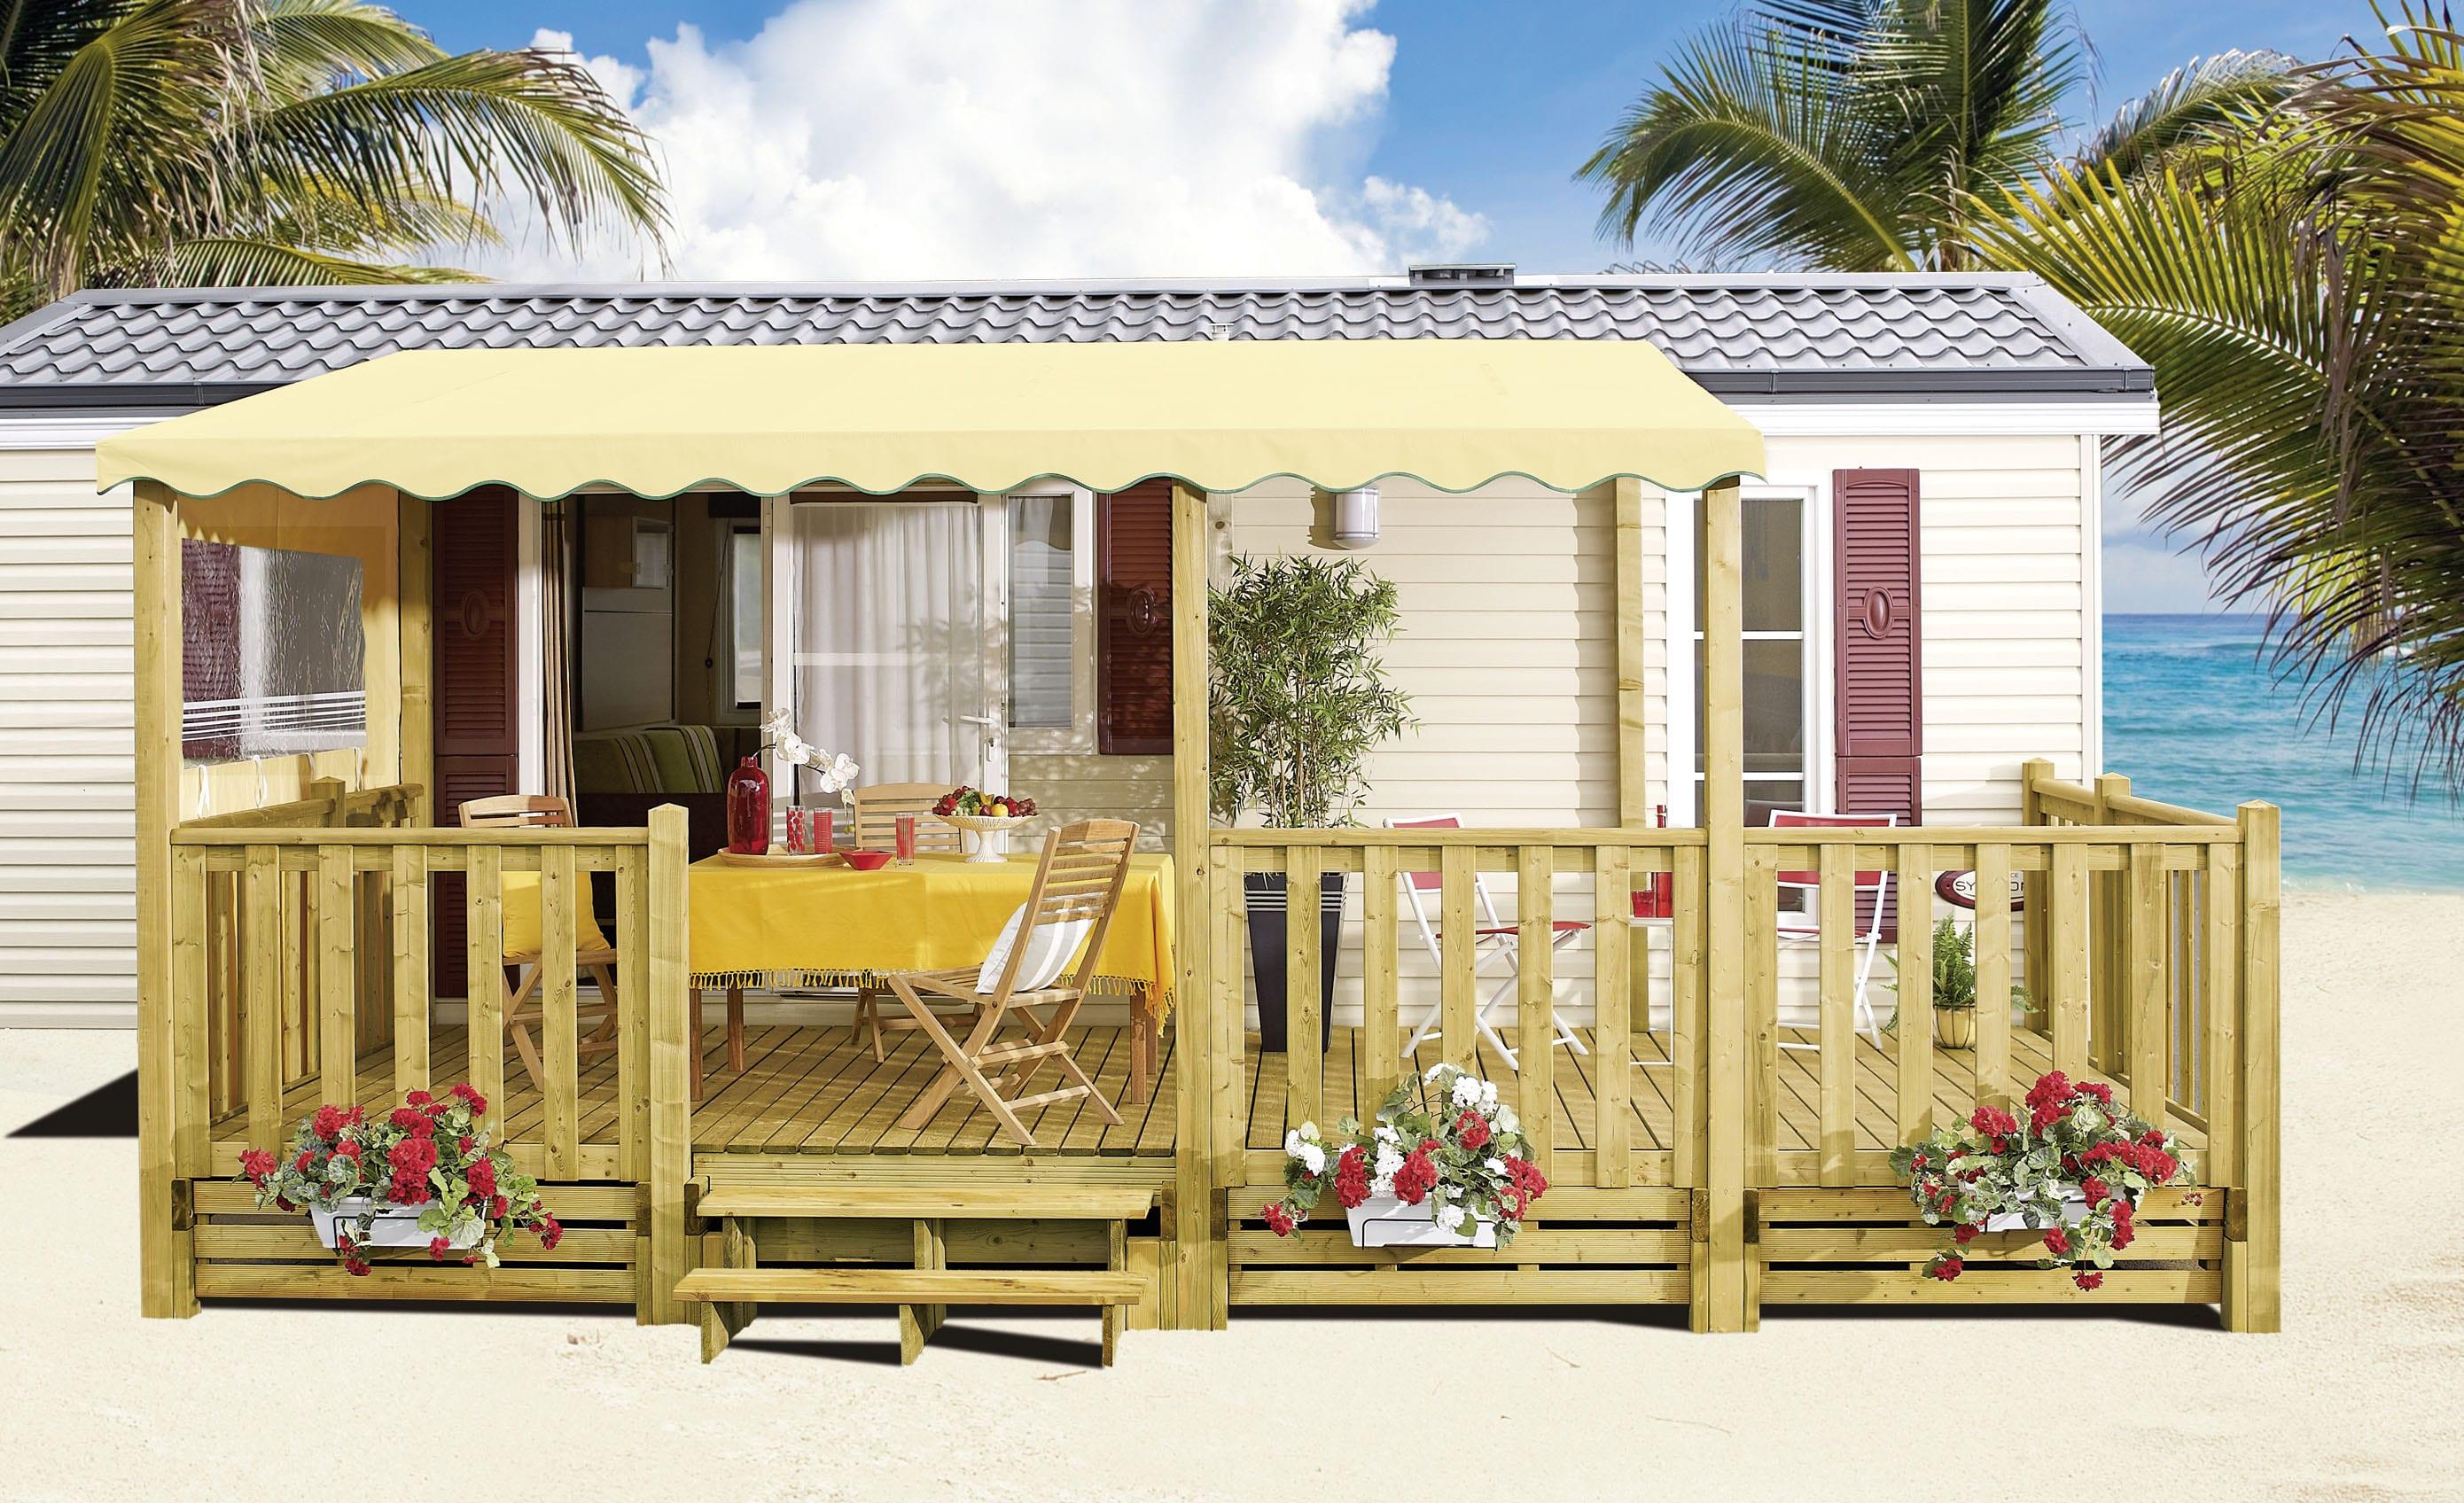 Terrasse Zen – 6×2.50m/3m – Semi couverte – 22mm – Collection 2019 – 2 053€